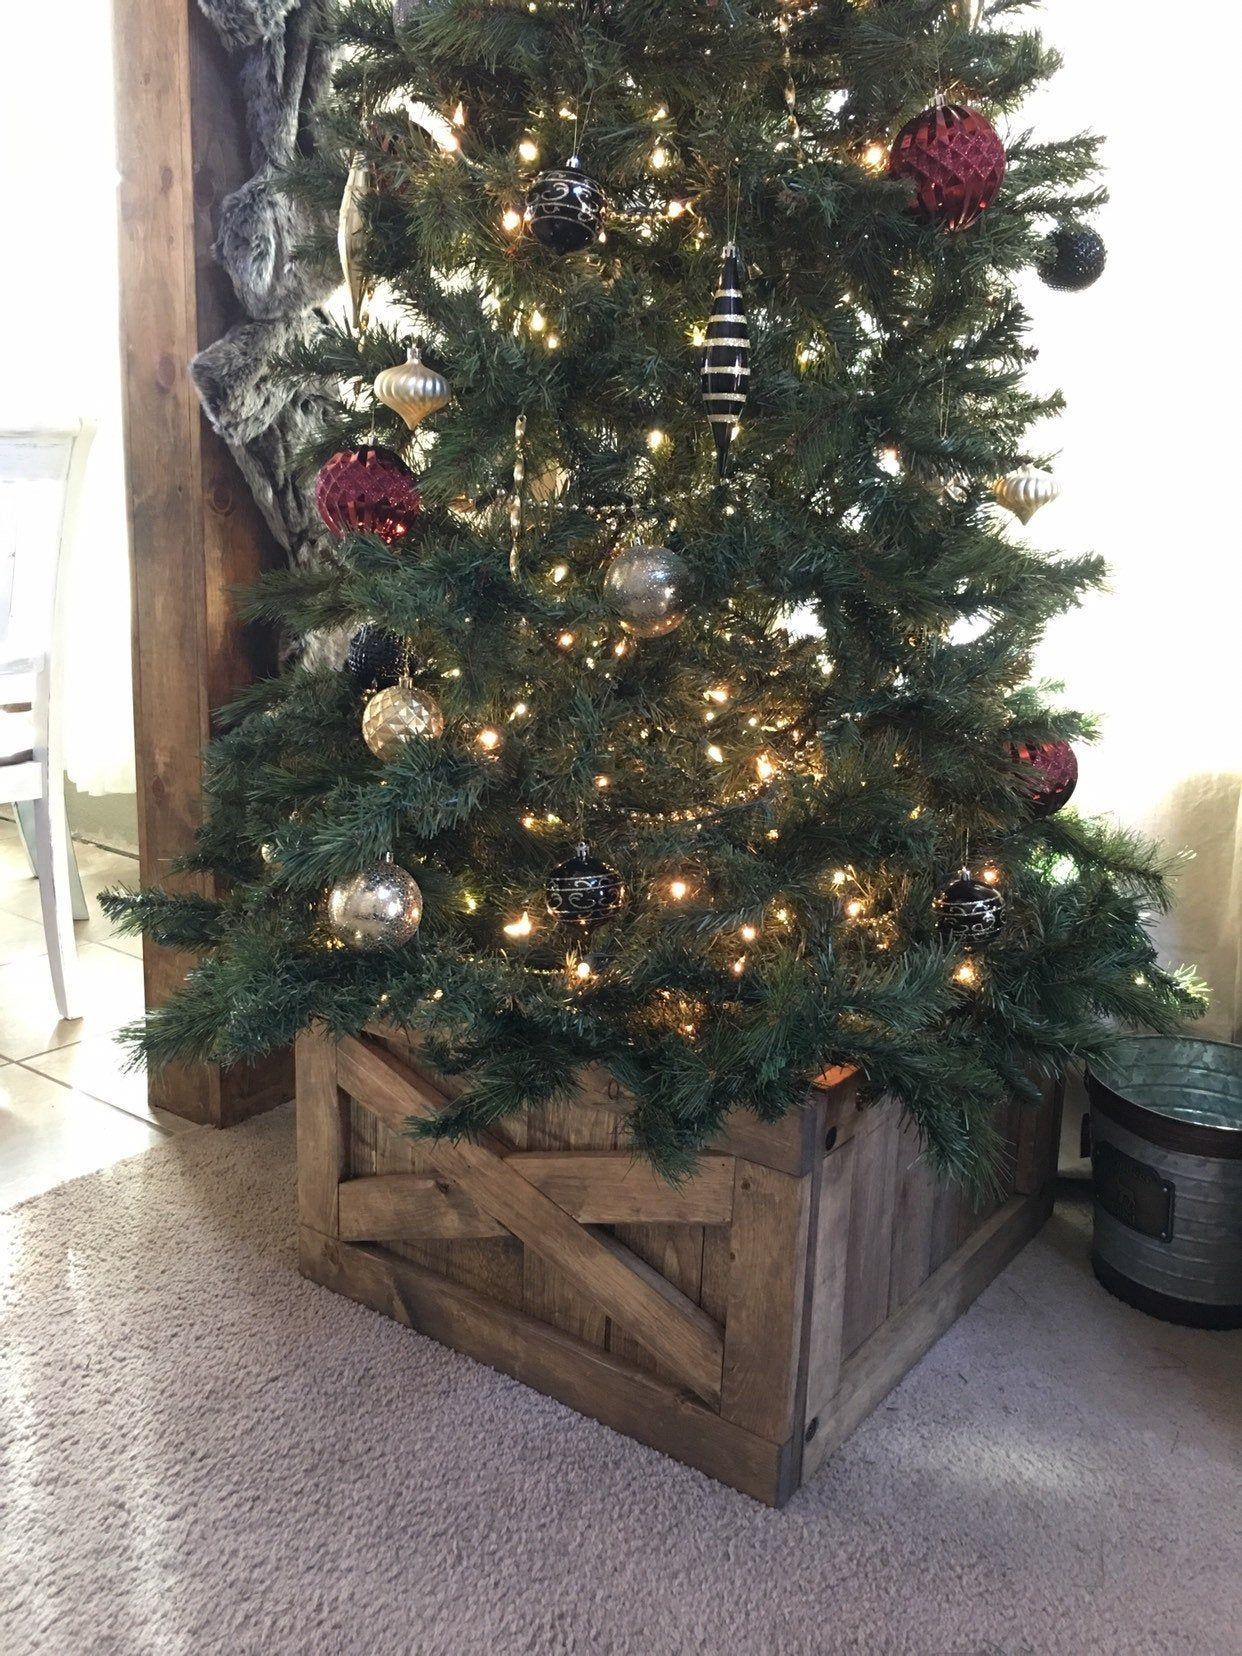 Christmas Tree Box Tree Skirt Alternative Wood Tree Box Collapsible Tree Skirt Christmas Tree Box Christmas Tree Porch Christmas Tree